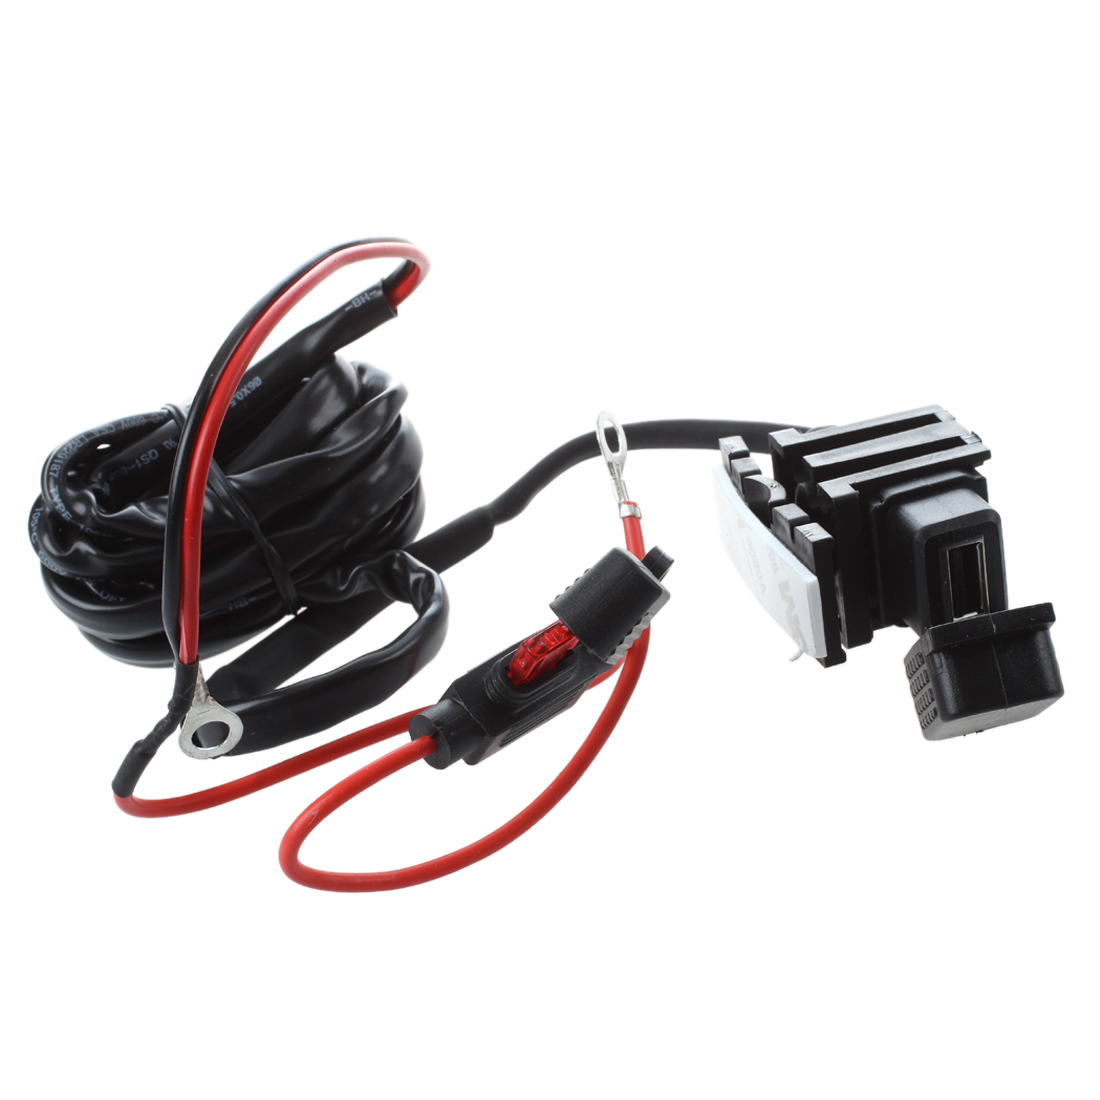 Motorcycle Bike USB Power Supply Port Socket Charger for Cell Phone 12V/24V